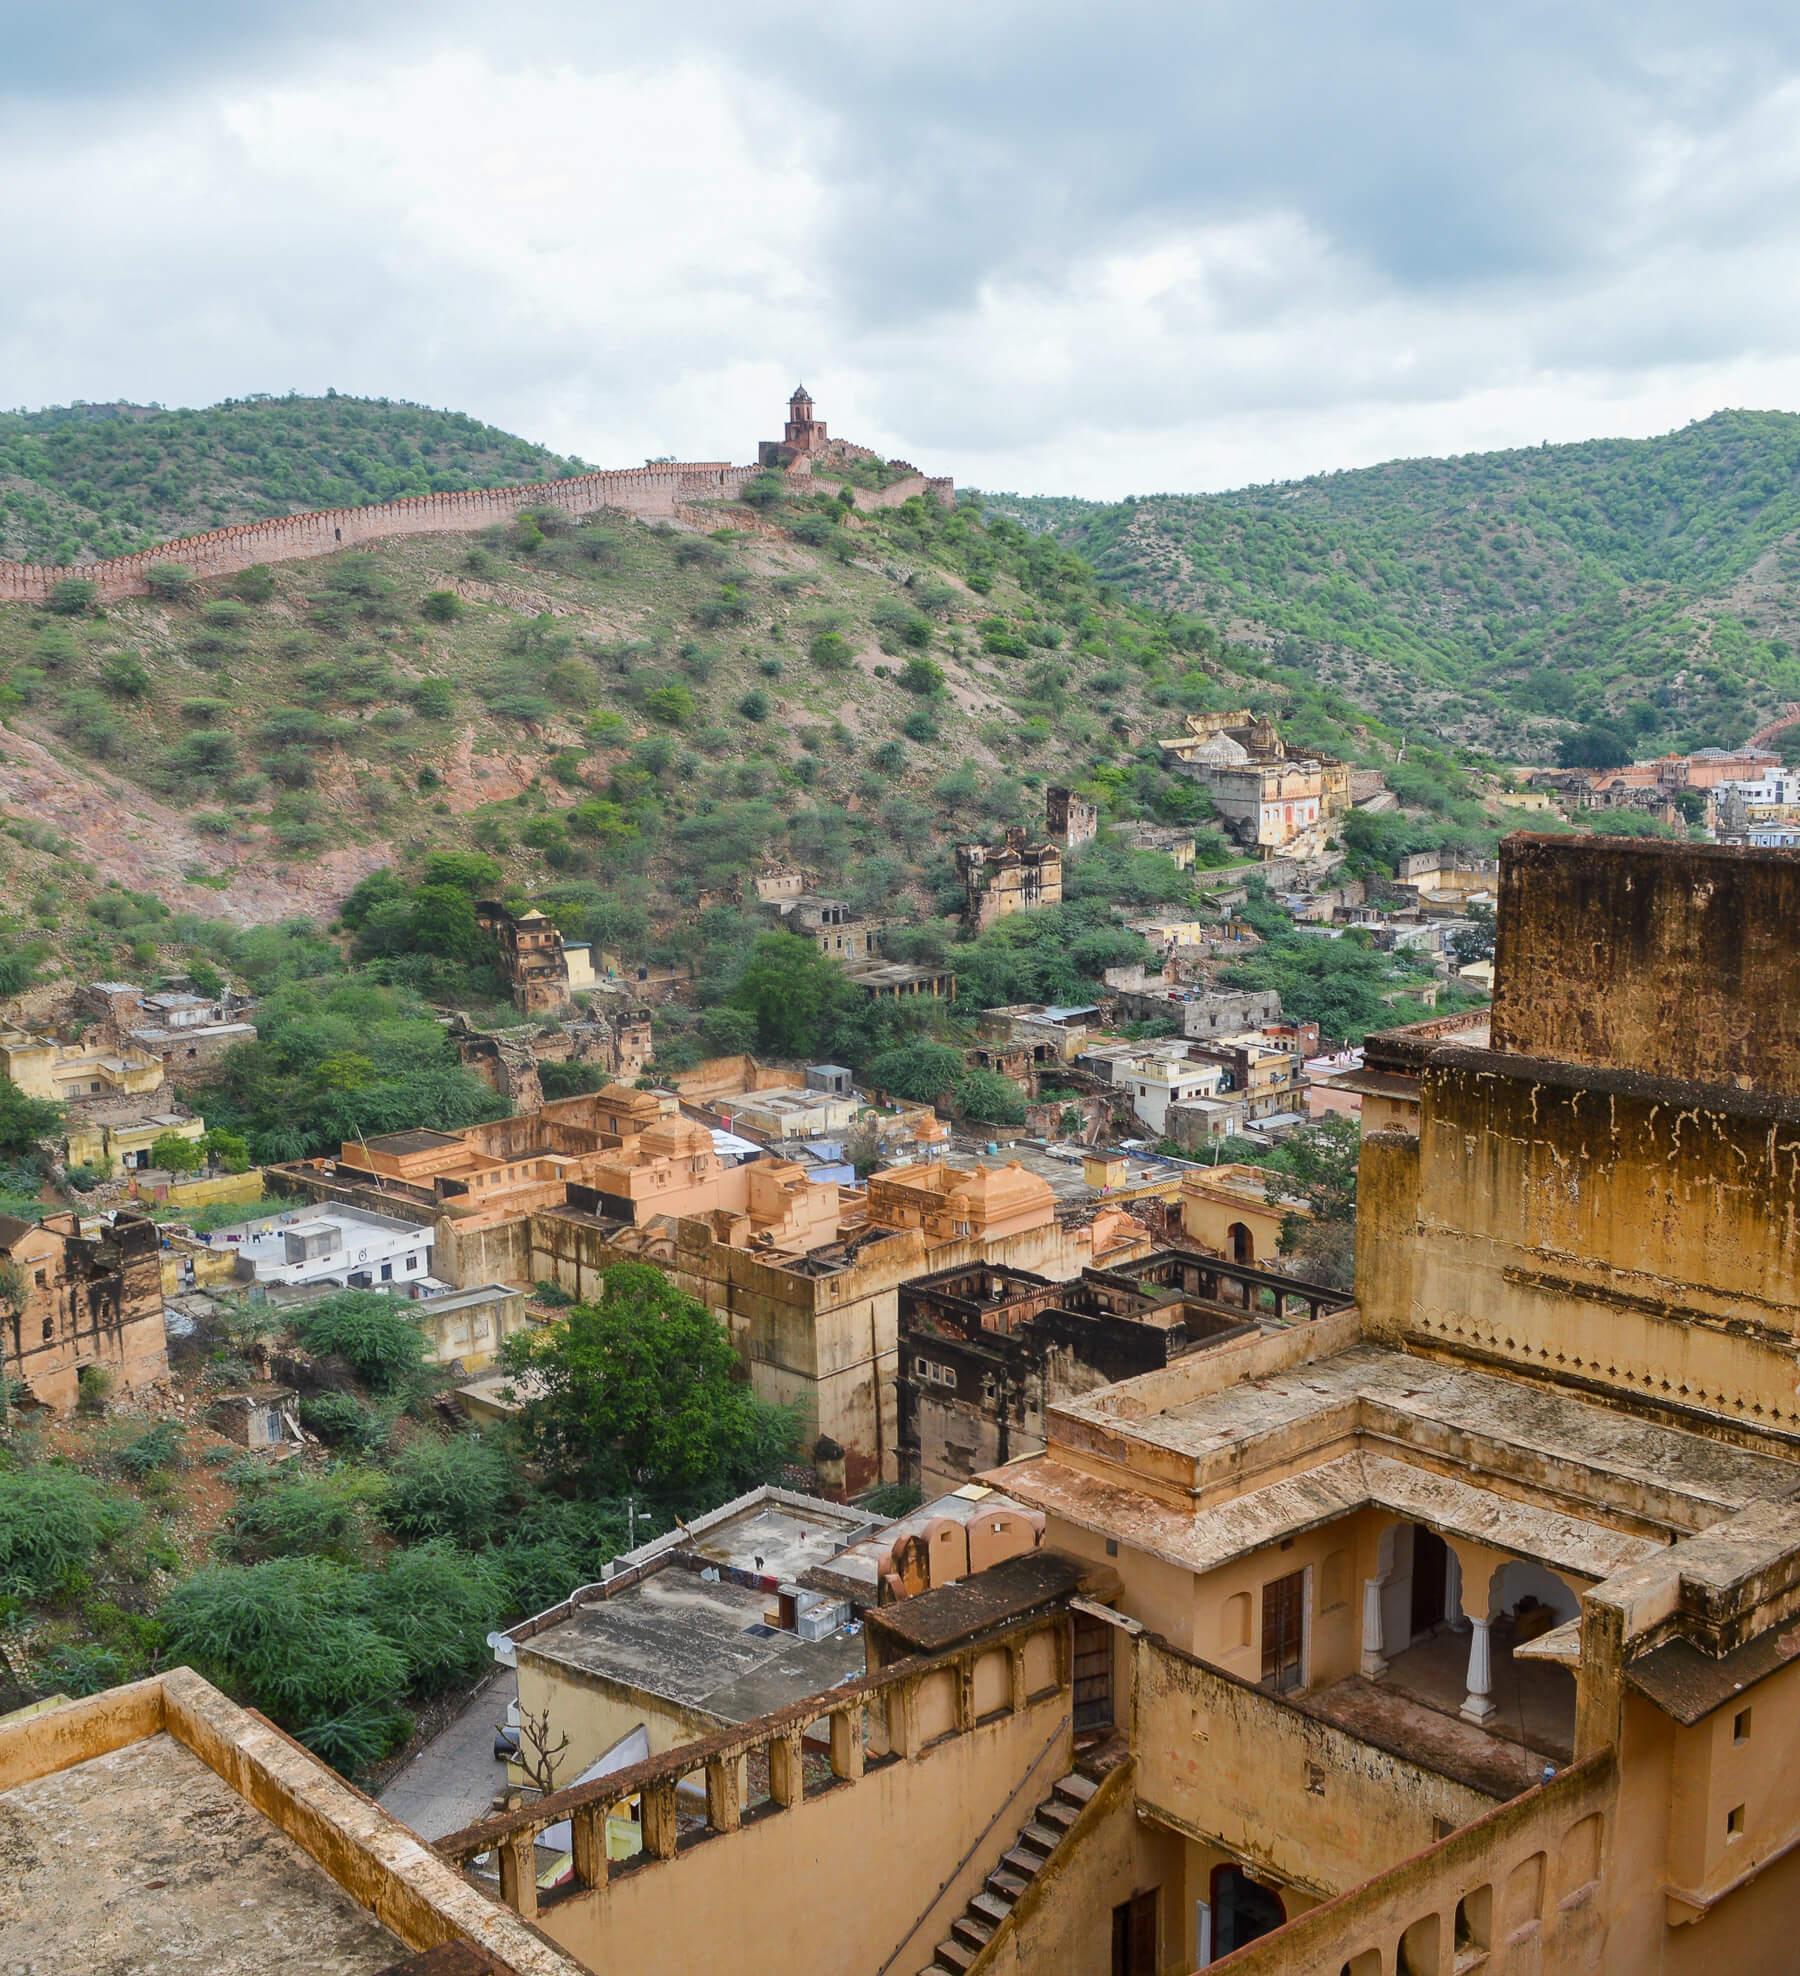 Rugged Terrain surrounding Amber Fort in Jaipur